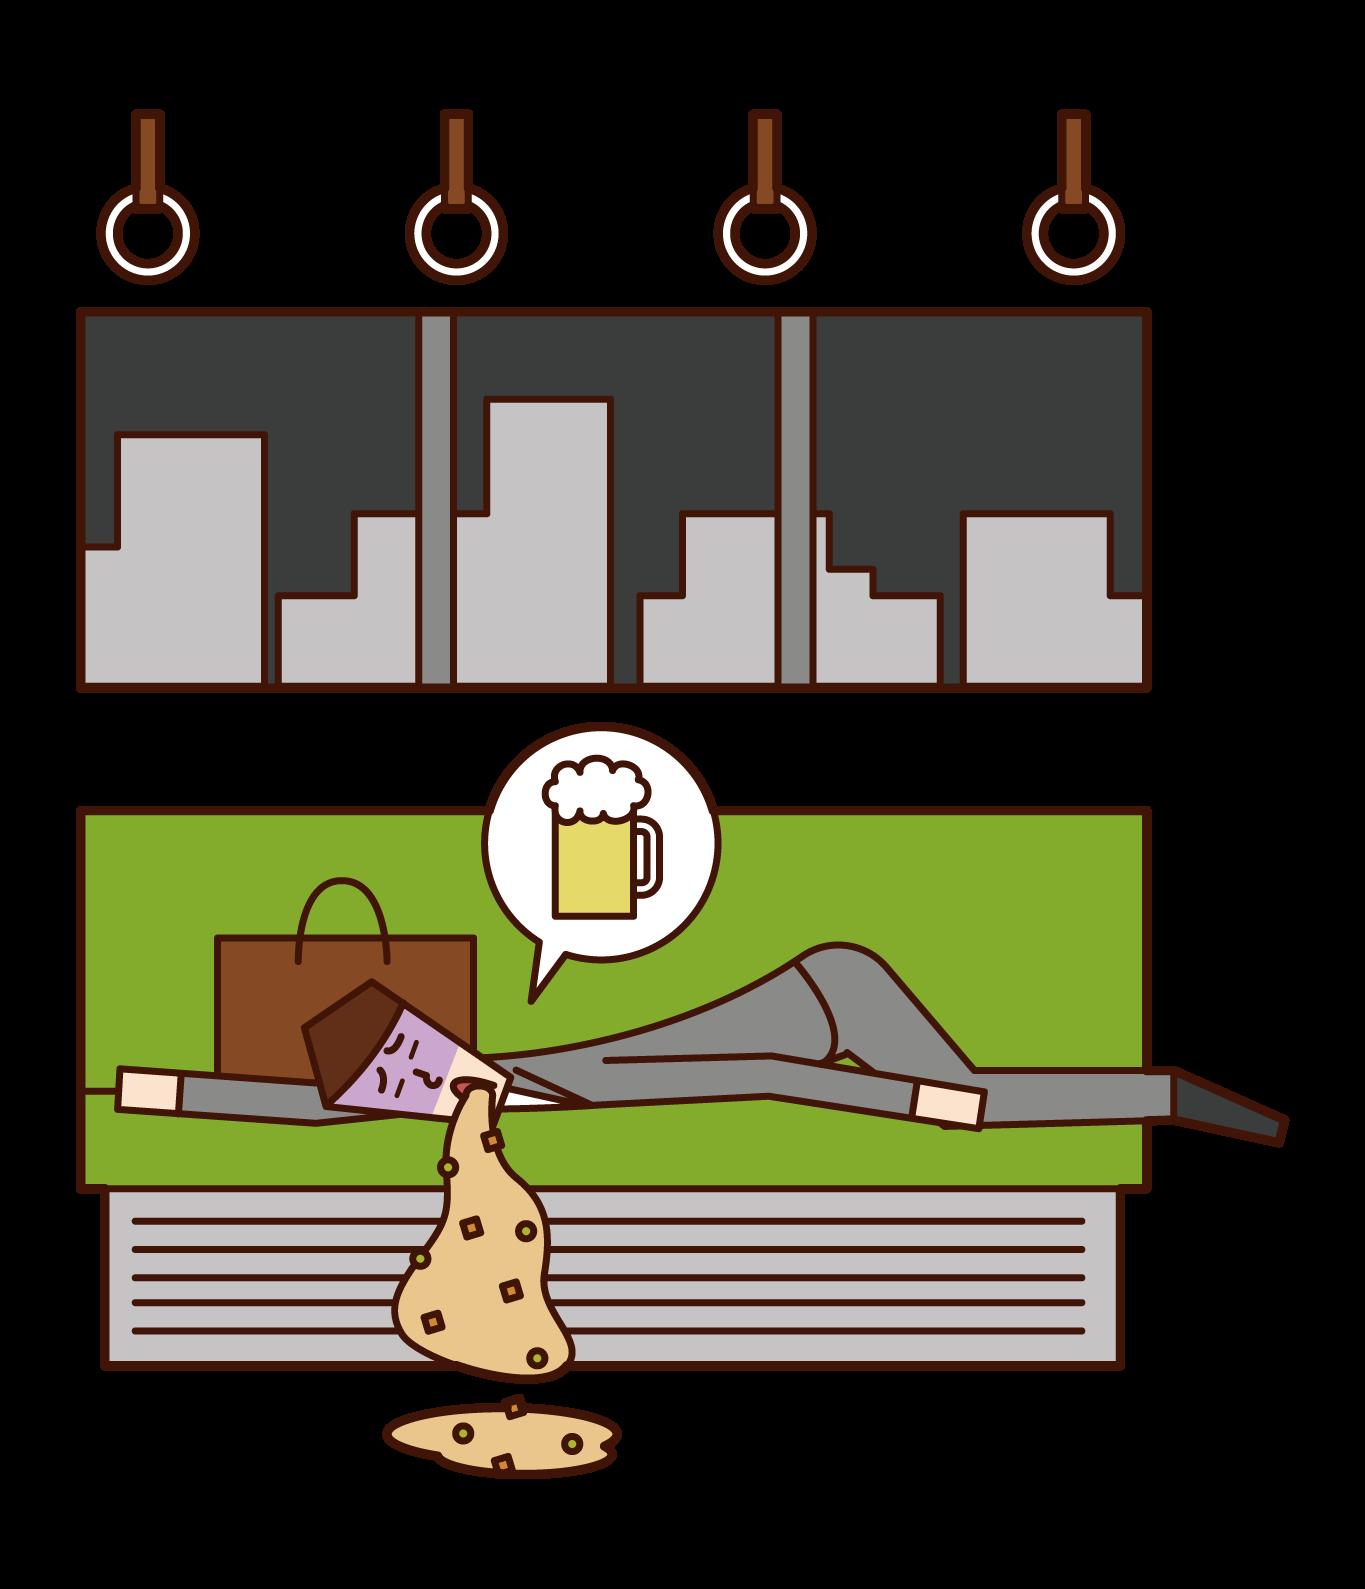 Illustration of drunk (man) vomiting on train